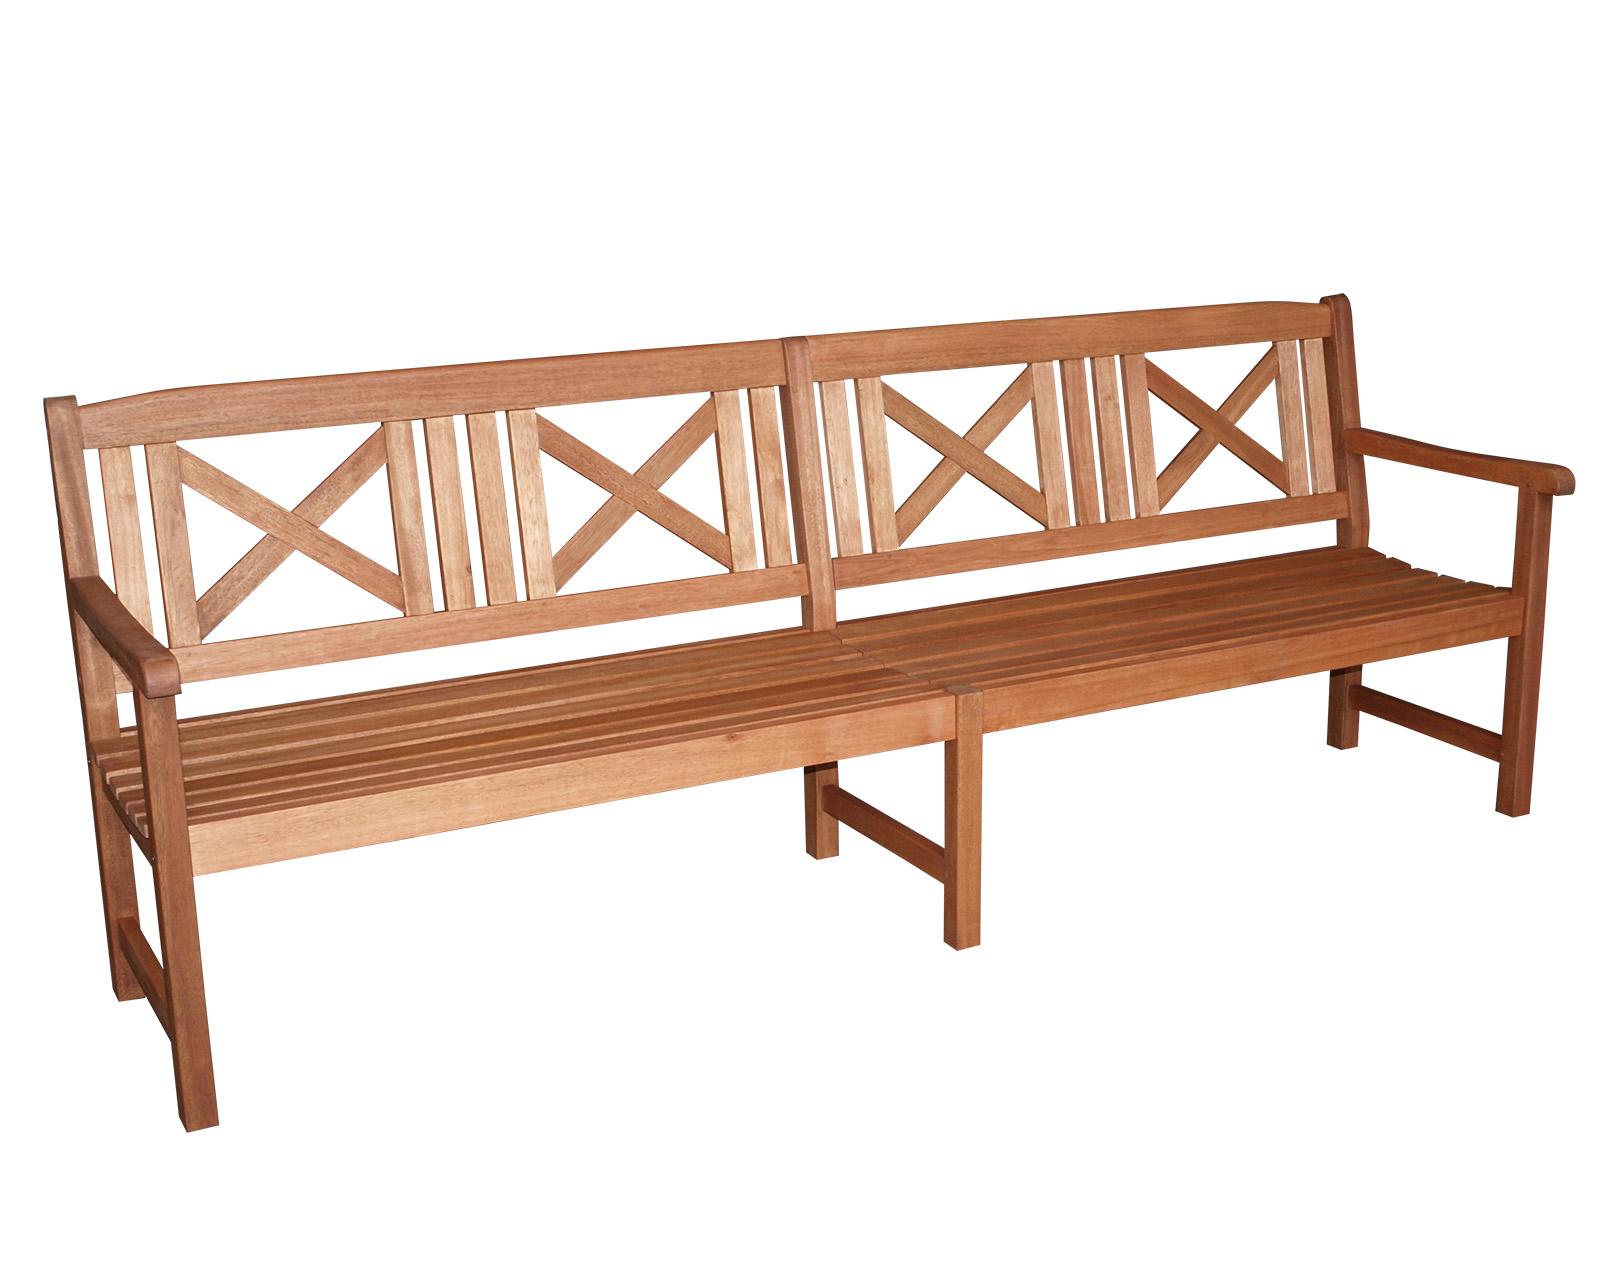 xxl landhausbank gartenbank grenada 4 sitzer 243cm eukalyptusholz fsc zert ebay. Black Bedroom Furniture Sets. Home Design Ideas